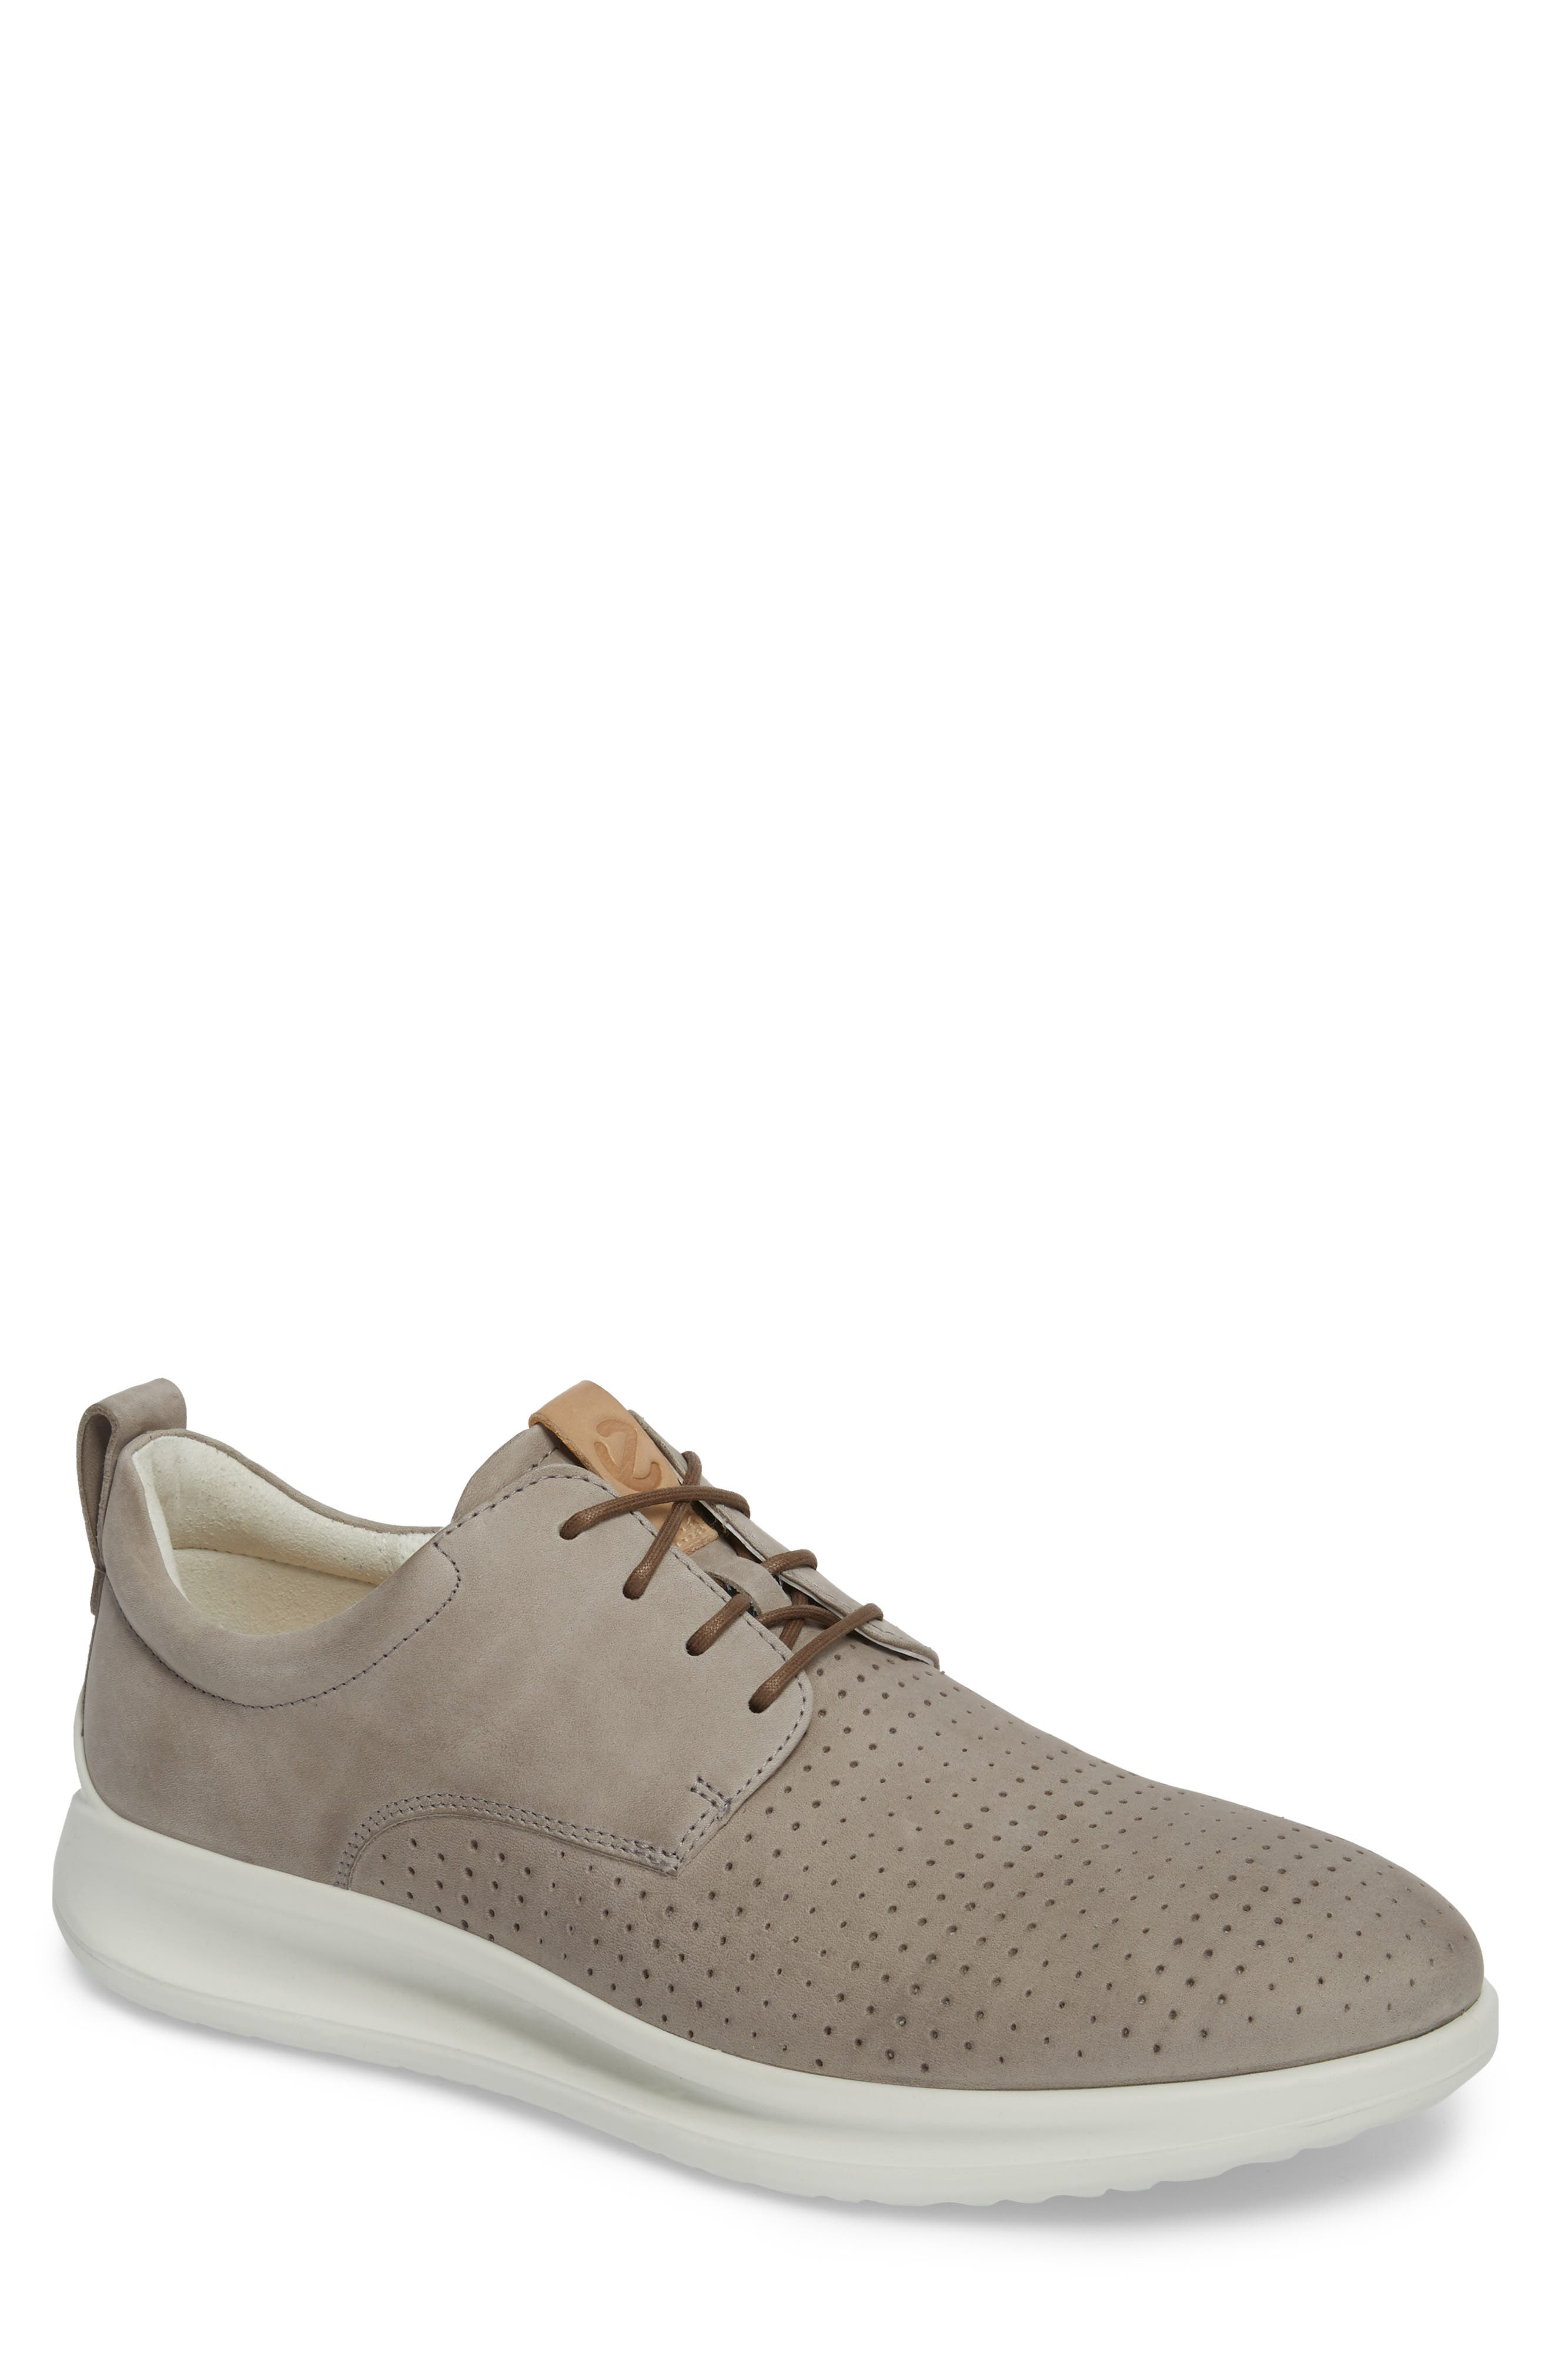 Aquet Sneaker,                             Main thumbnail 1, color,                             Moon Rock Leather